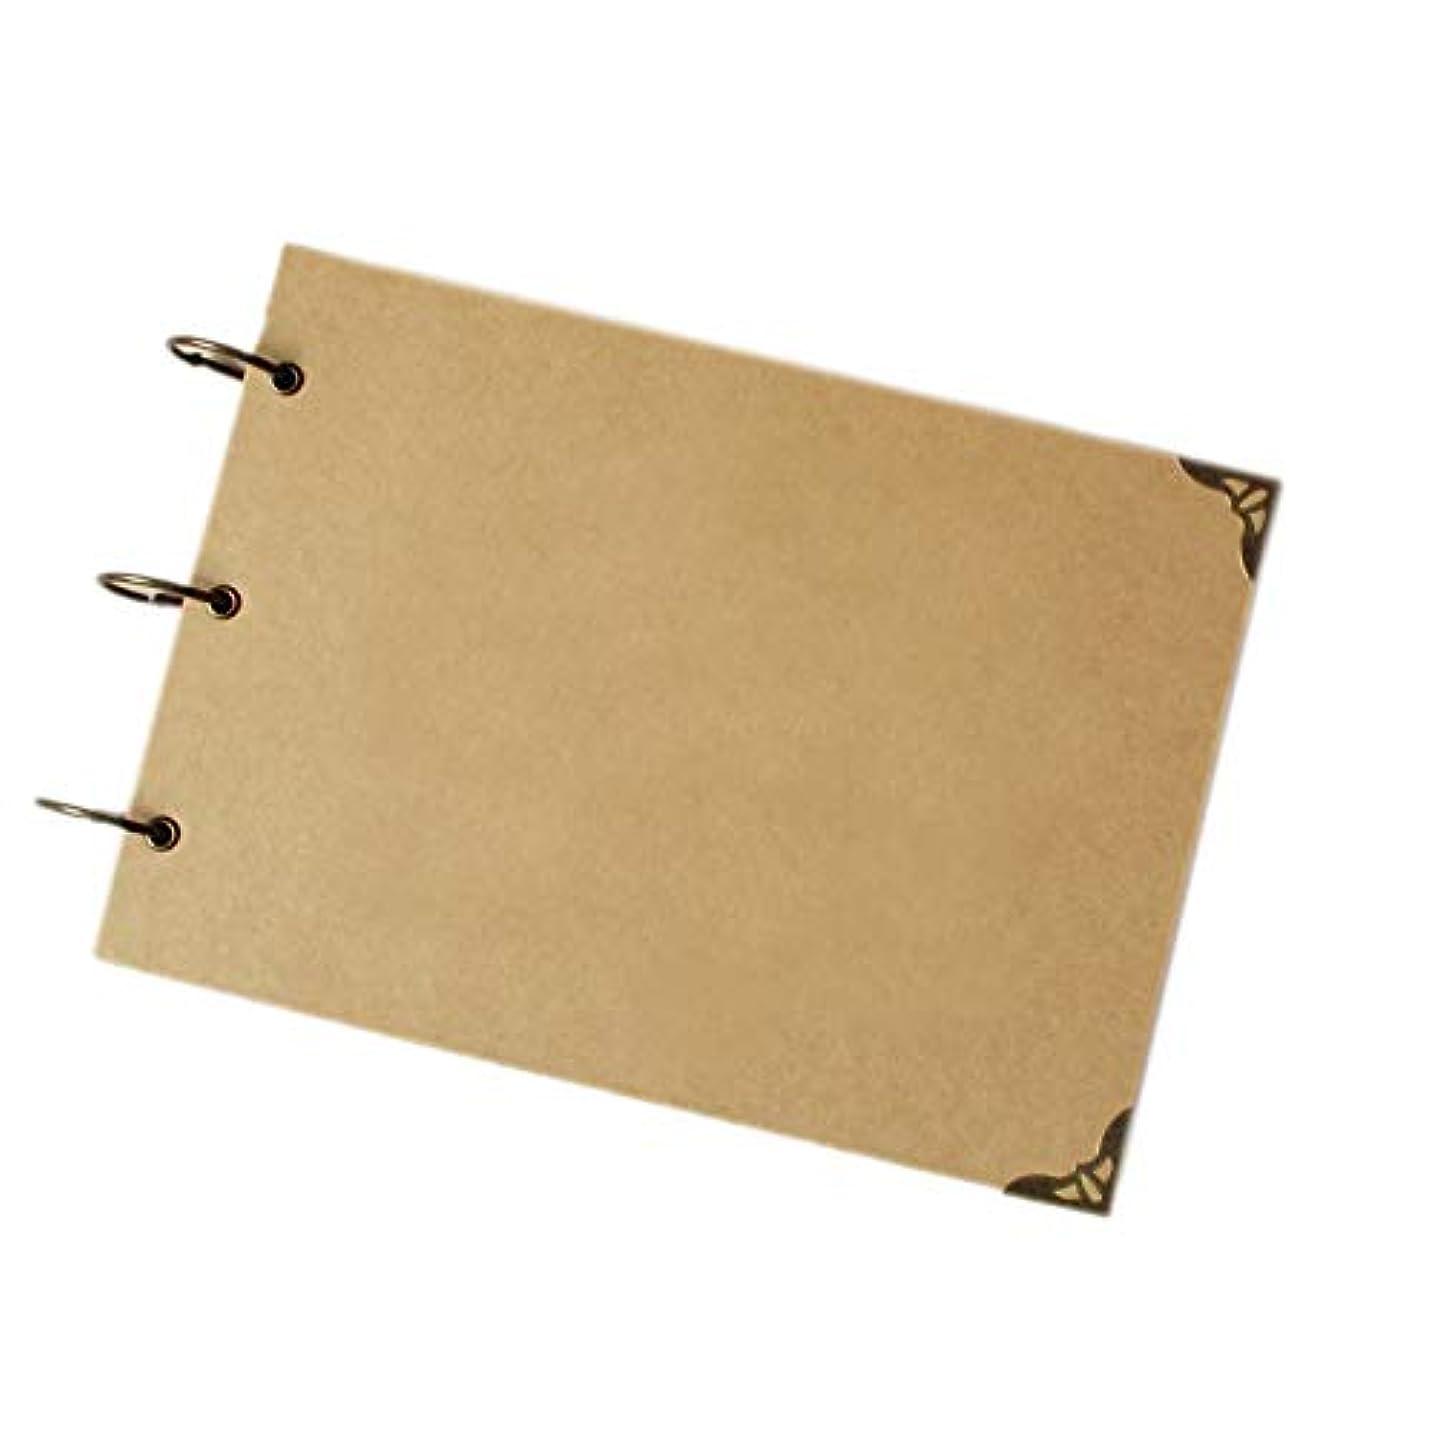 MINLIN A4 Ring Binder Photo Album Kraft Scrapbook Wedding Album Scrapbook Wedding Guest Book (Craft Insert)